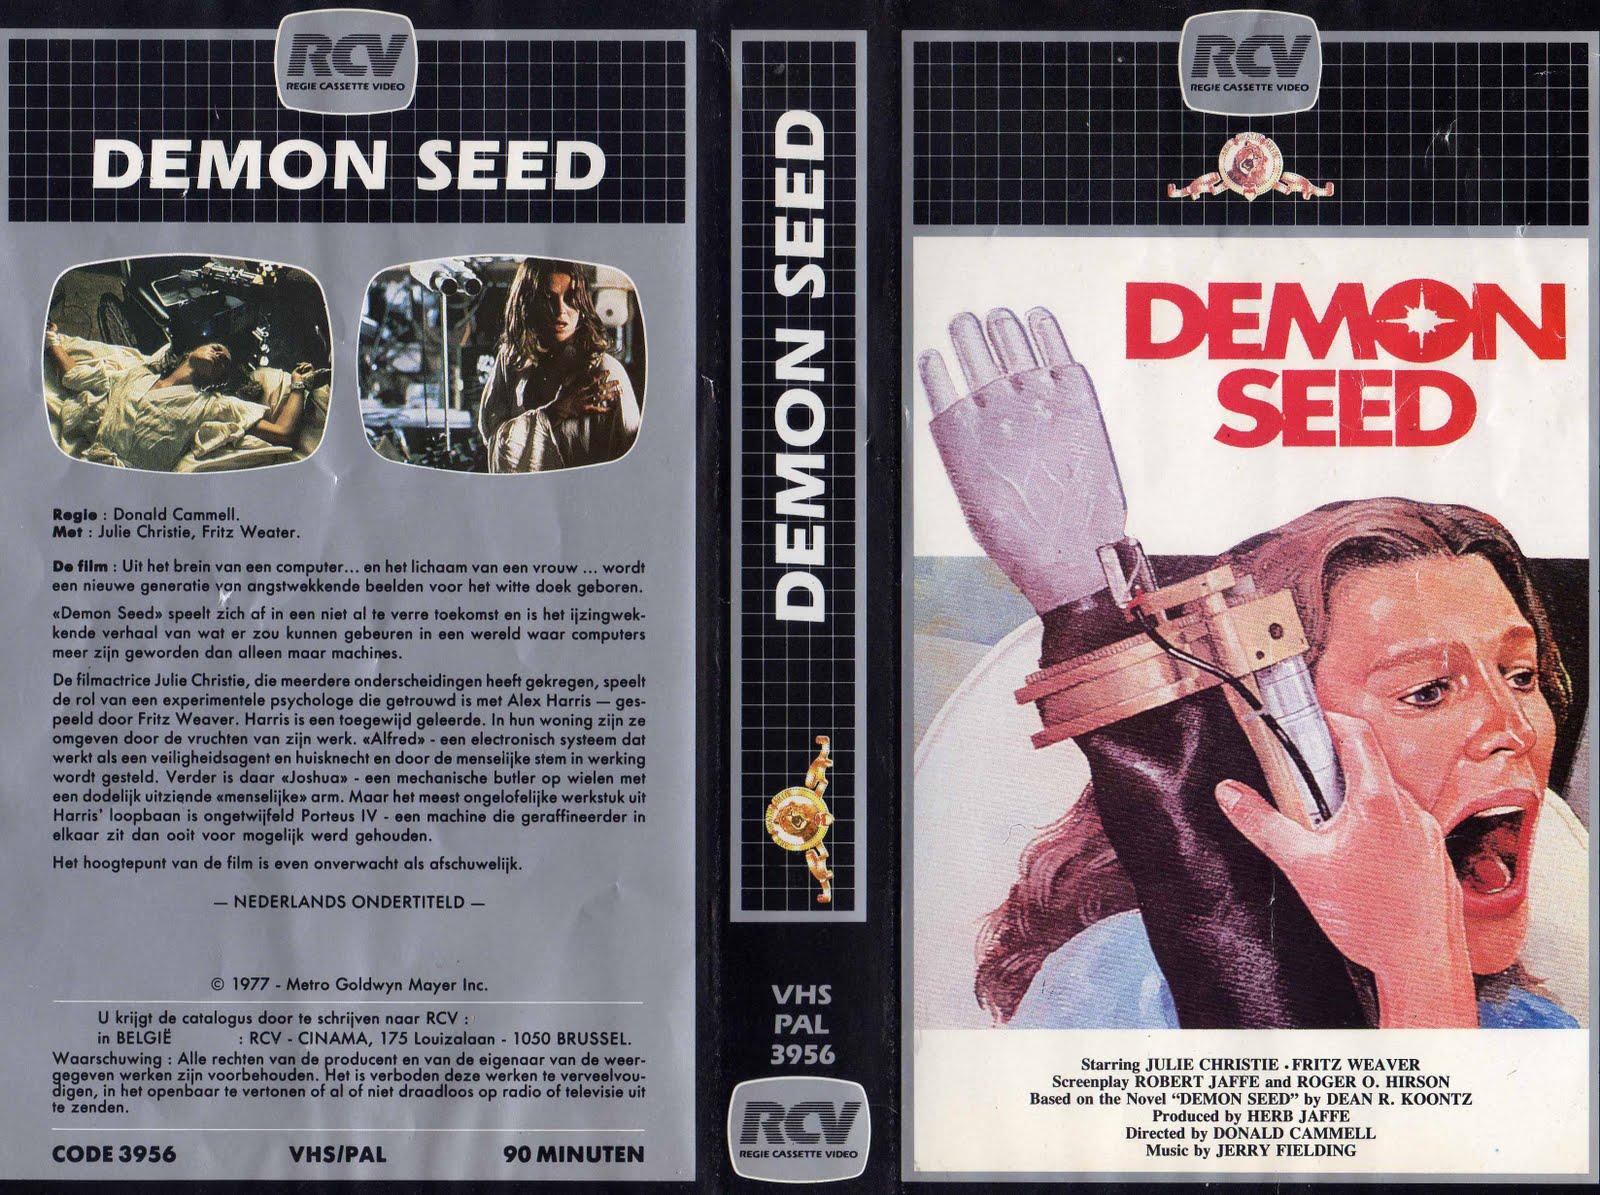 Demon Seed 1 Pcs Bursa Dapur Zen Porcelains Japanese Divided Dish 3 Sides 18 X 75 Cm Dvd Menus Array Cult Vhs Rh Cultvhs Blogspot Com